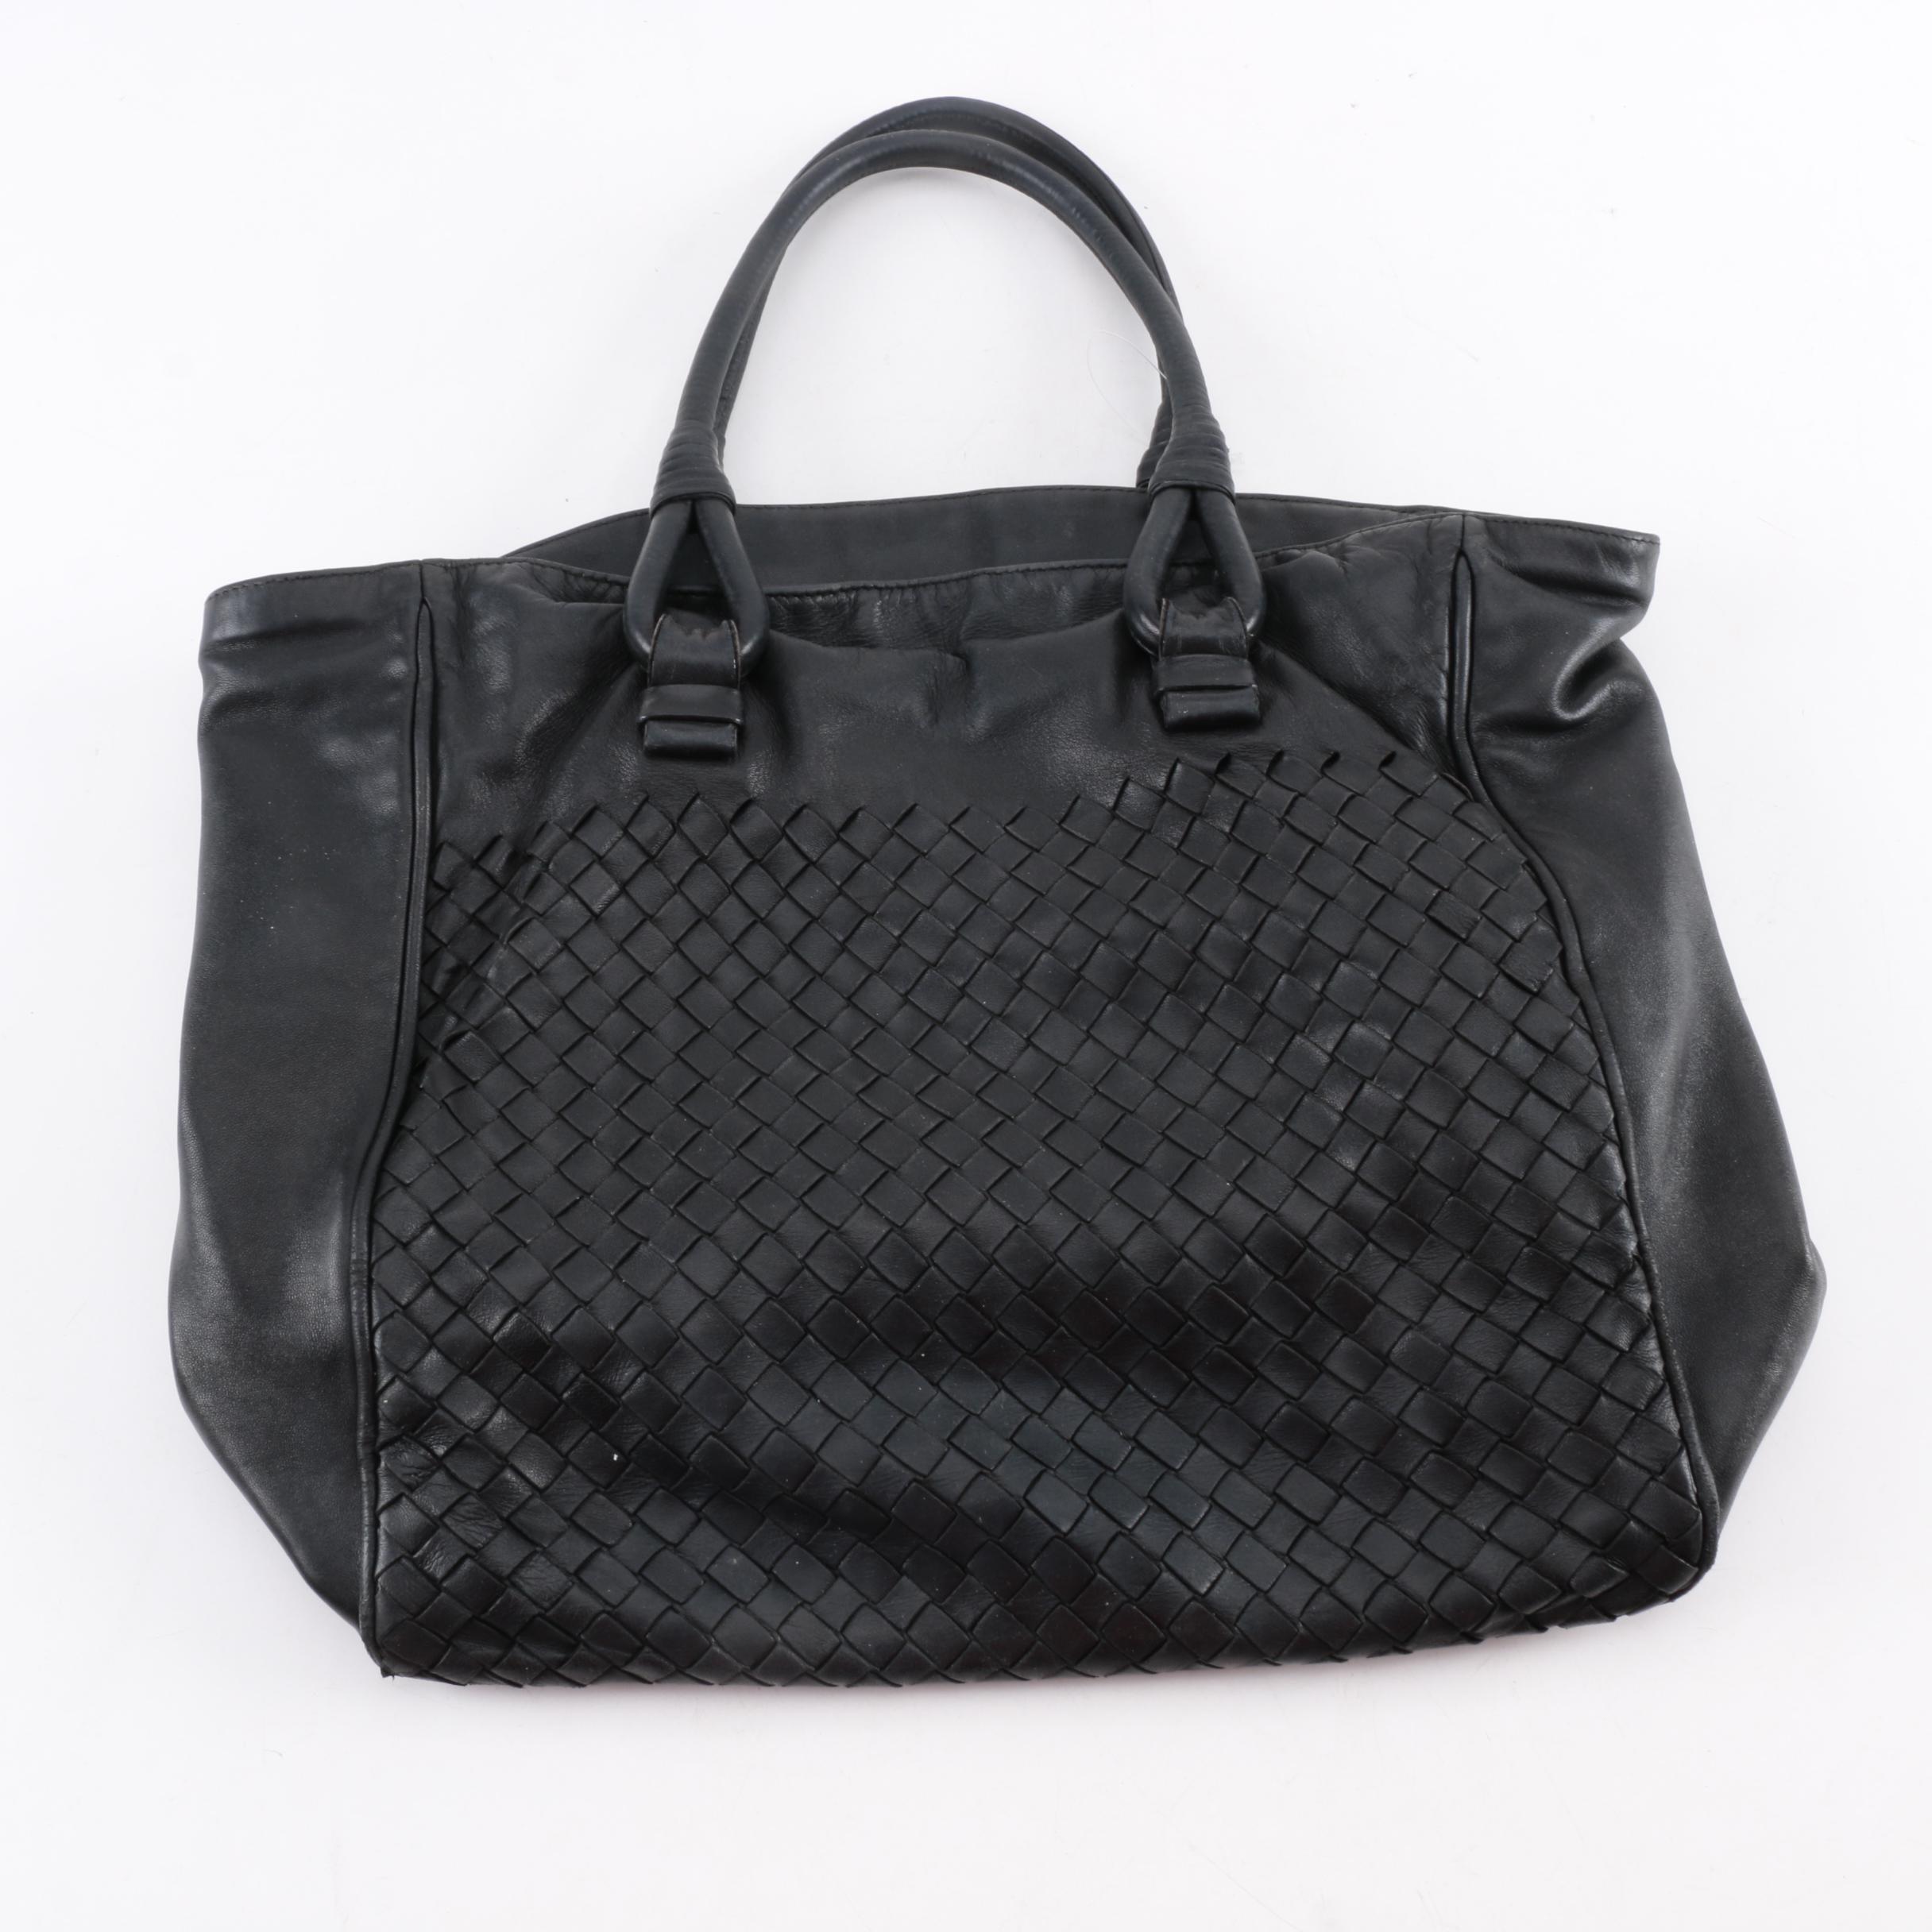 Bottega Veneta Black Woven Leather Tote Handbag